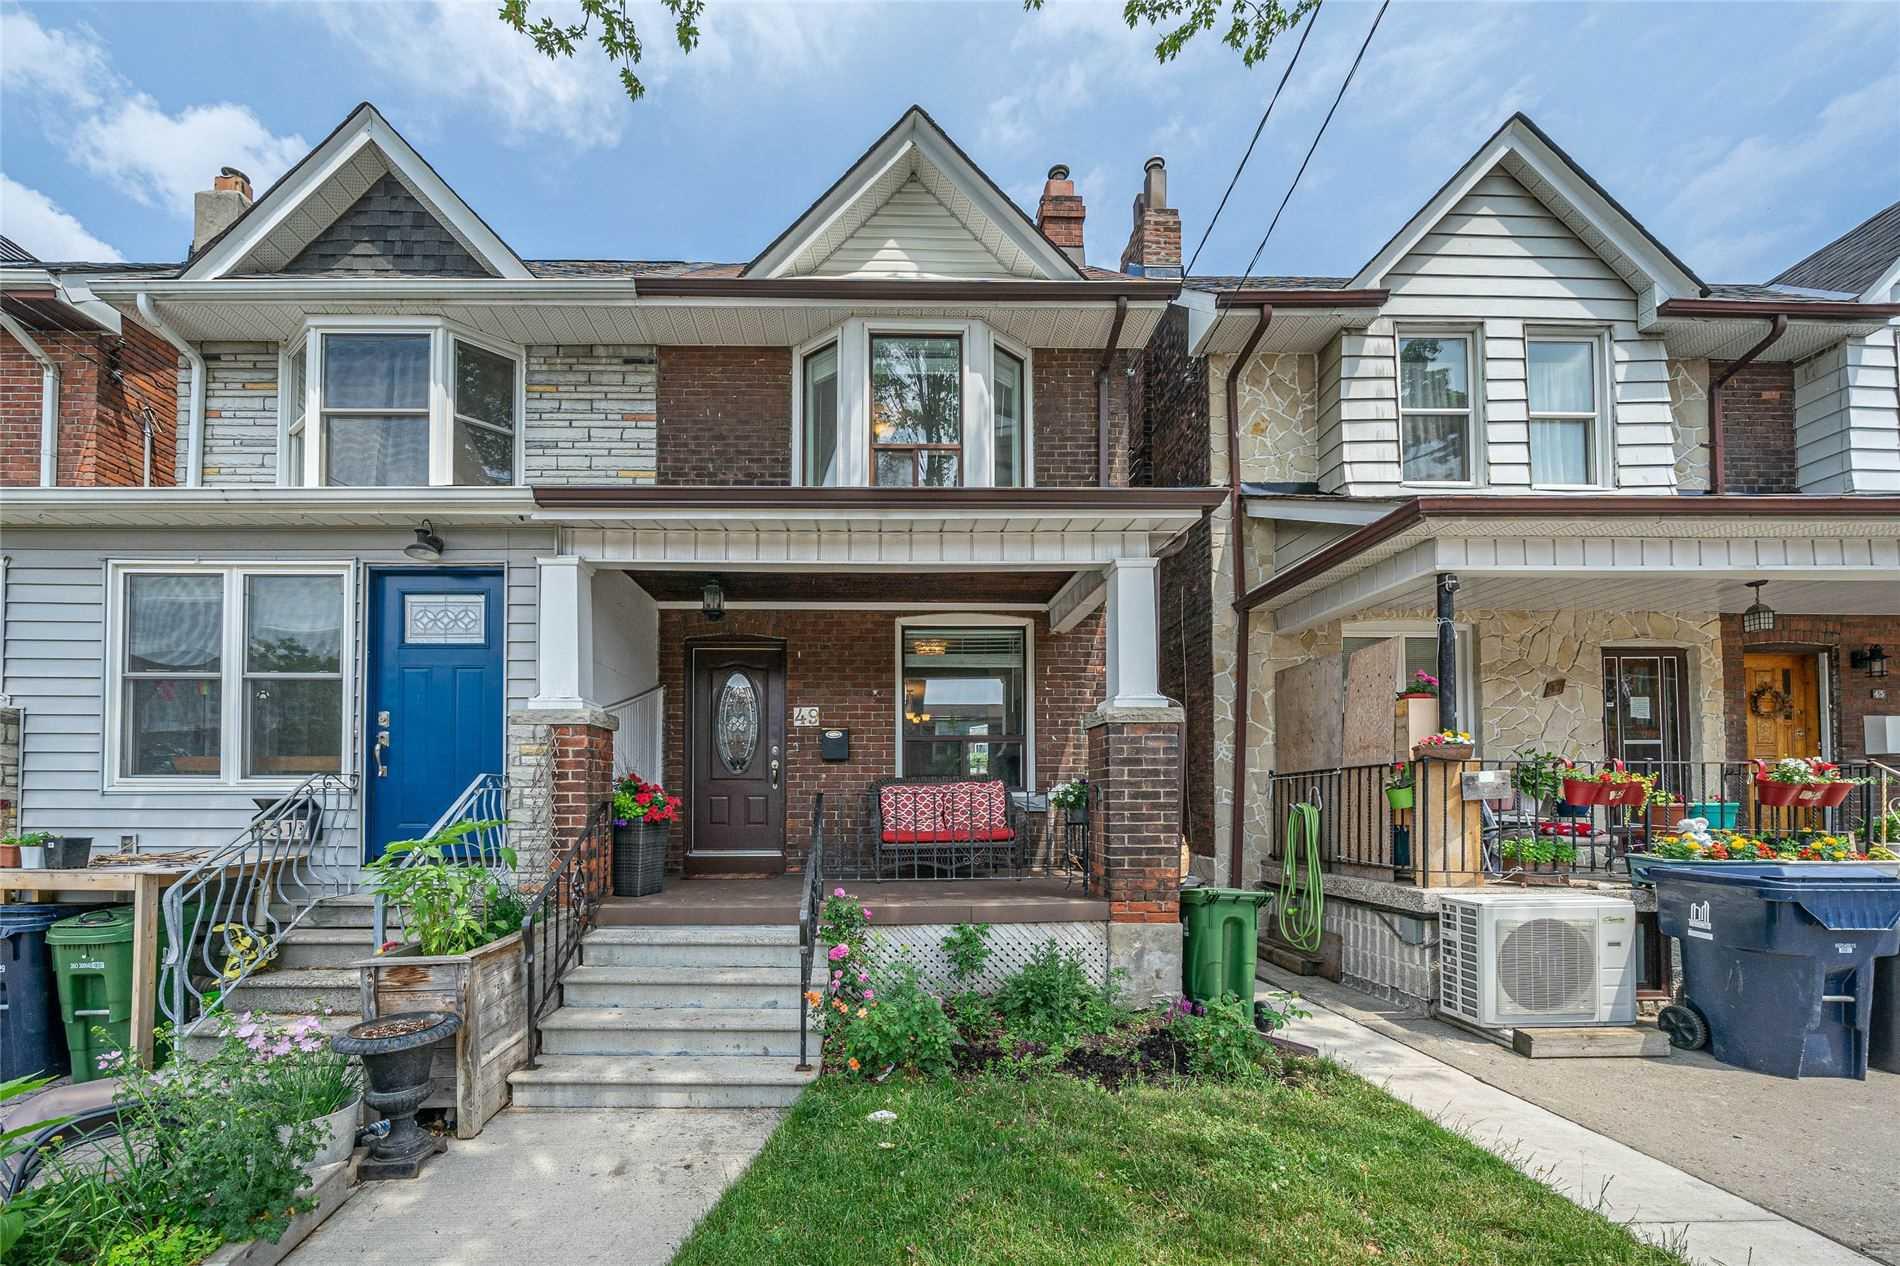 House For Sale 49 Gillespie Ave, M6N2Y5, Weston-Pellam Park, Toronto